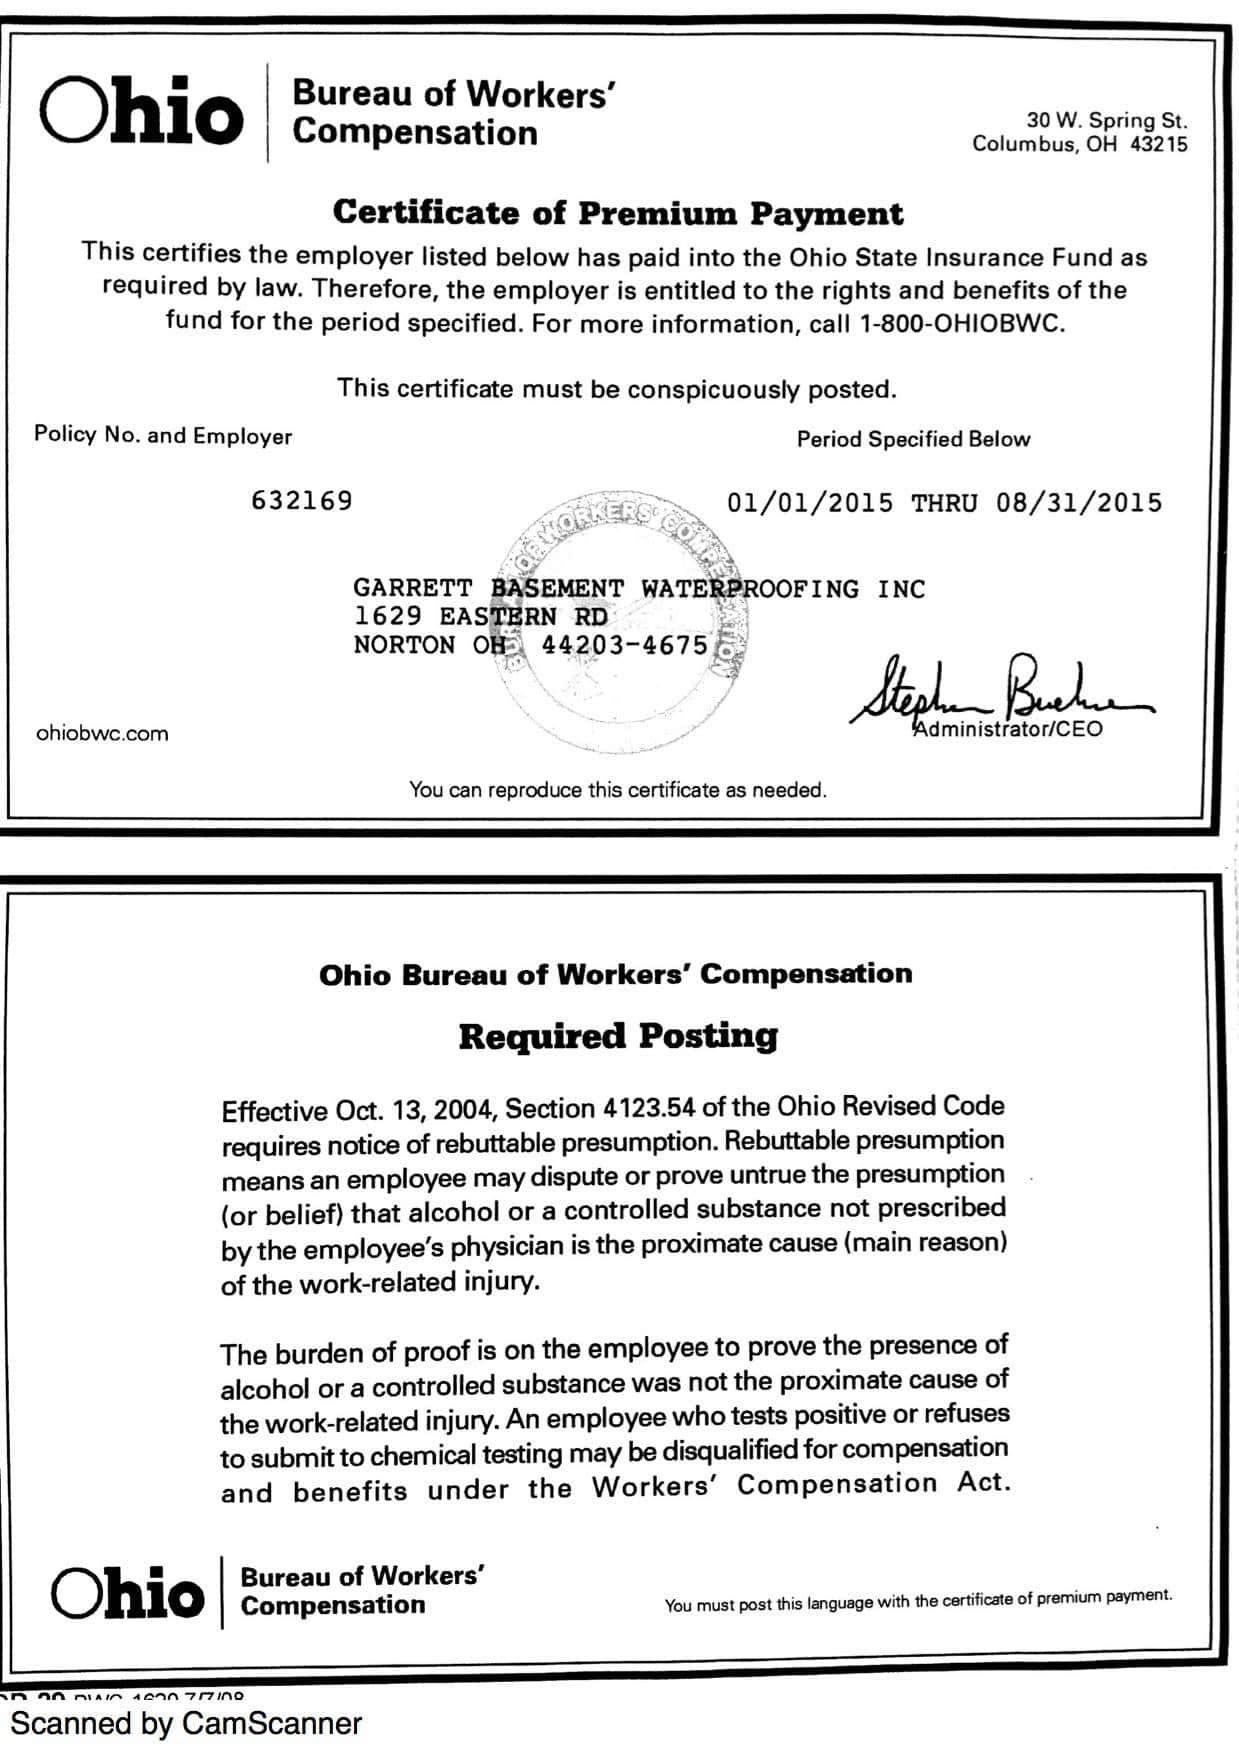 Garrett Basement Waterproofing Credentials for Akron Ohio